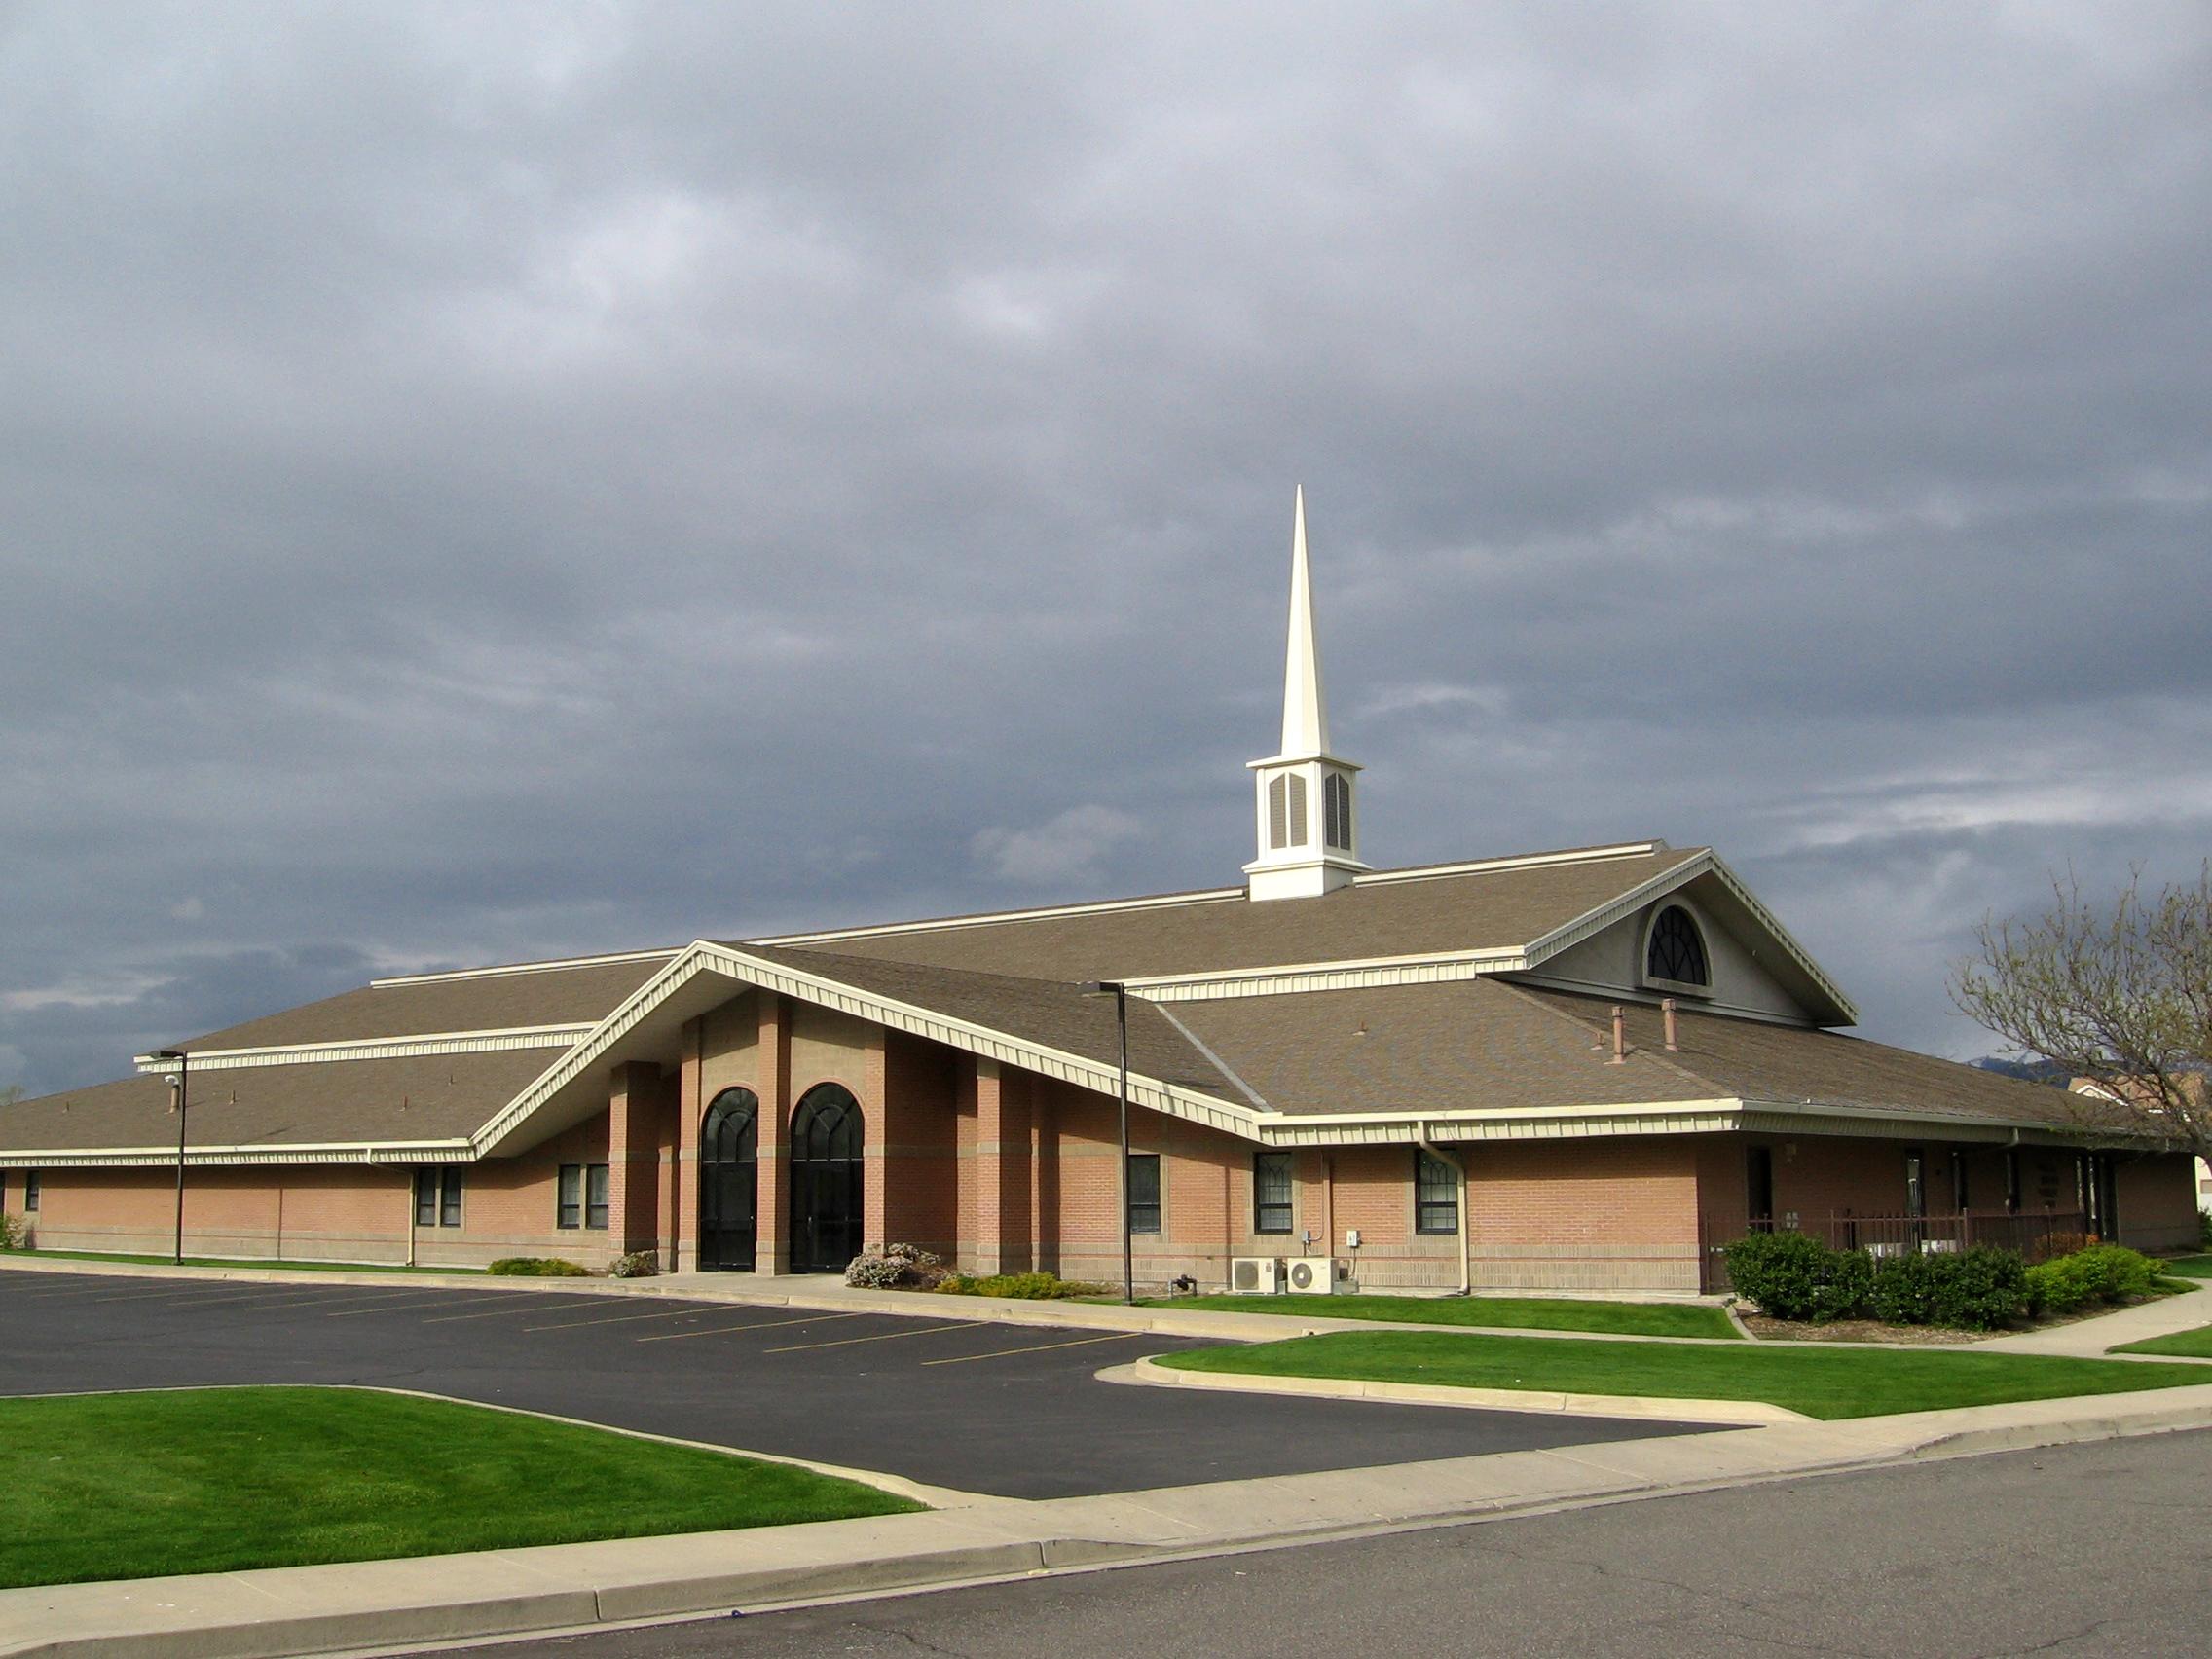 File:LDS stake center in West Valley City, Utah.jpg